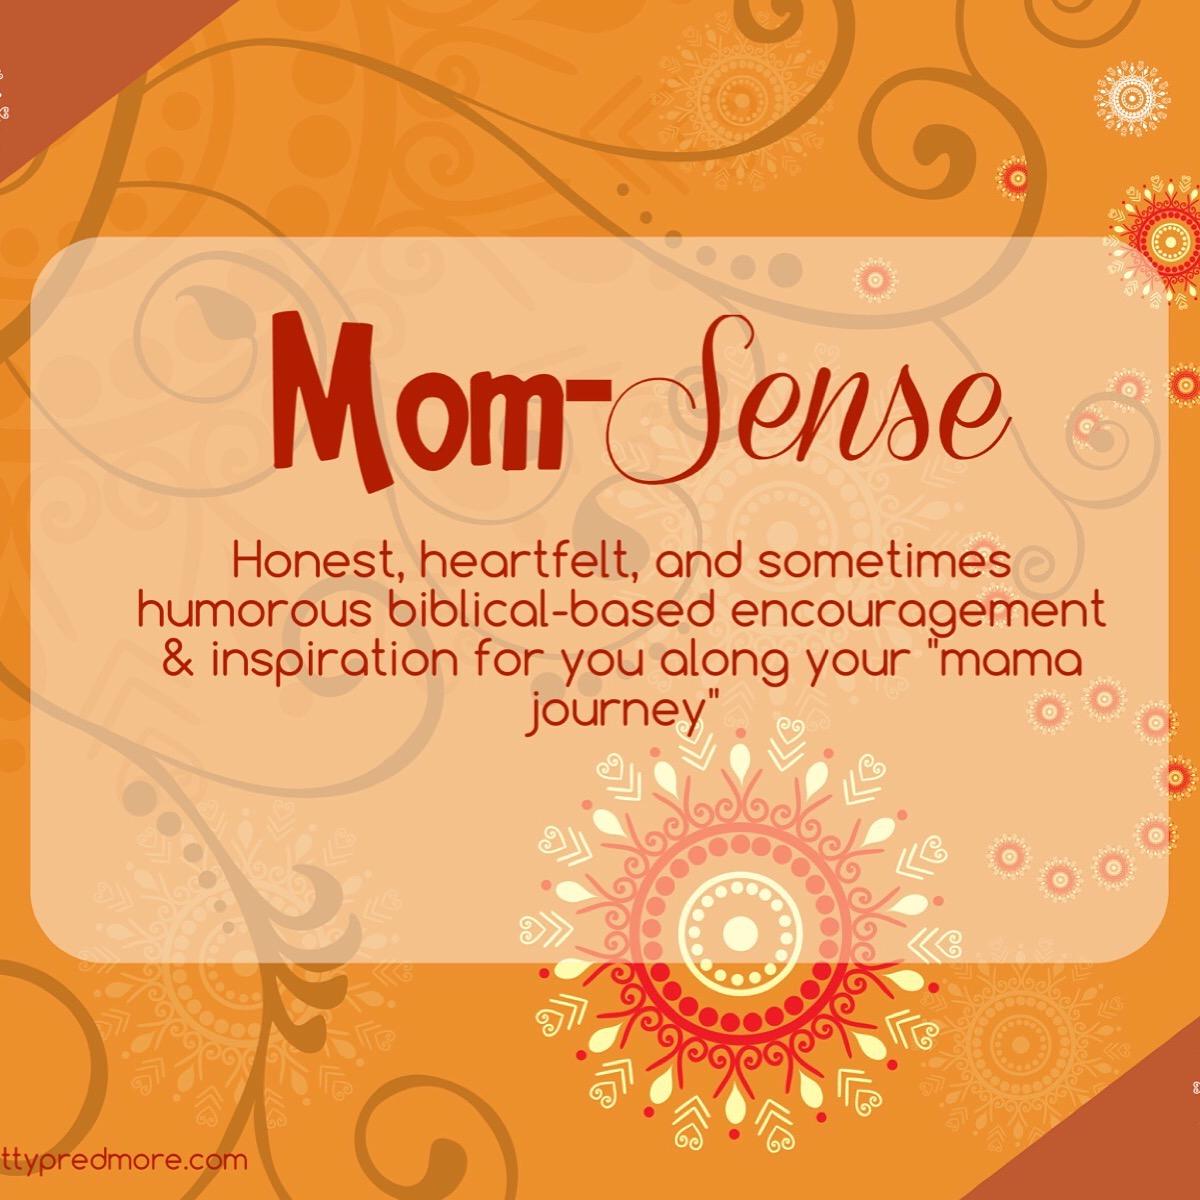 Mom -Sense – Mentorship ~ Connection ~Service